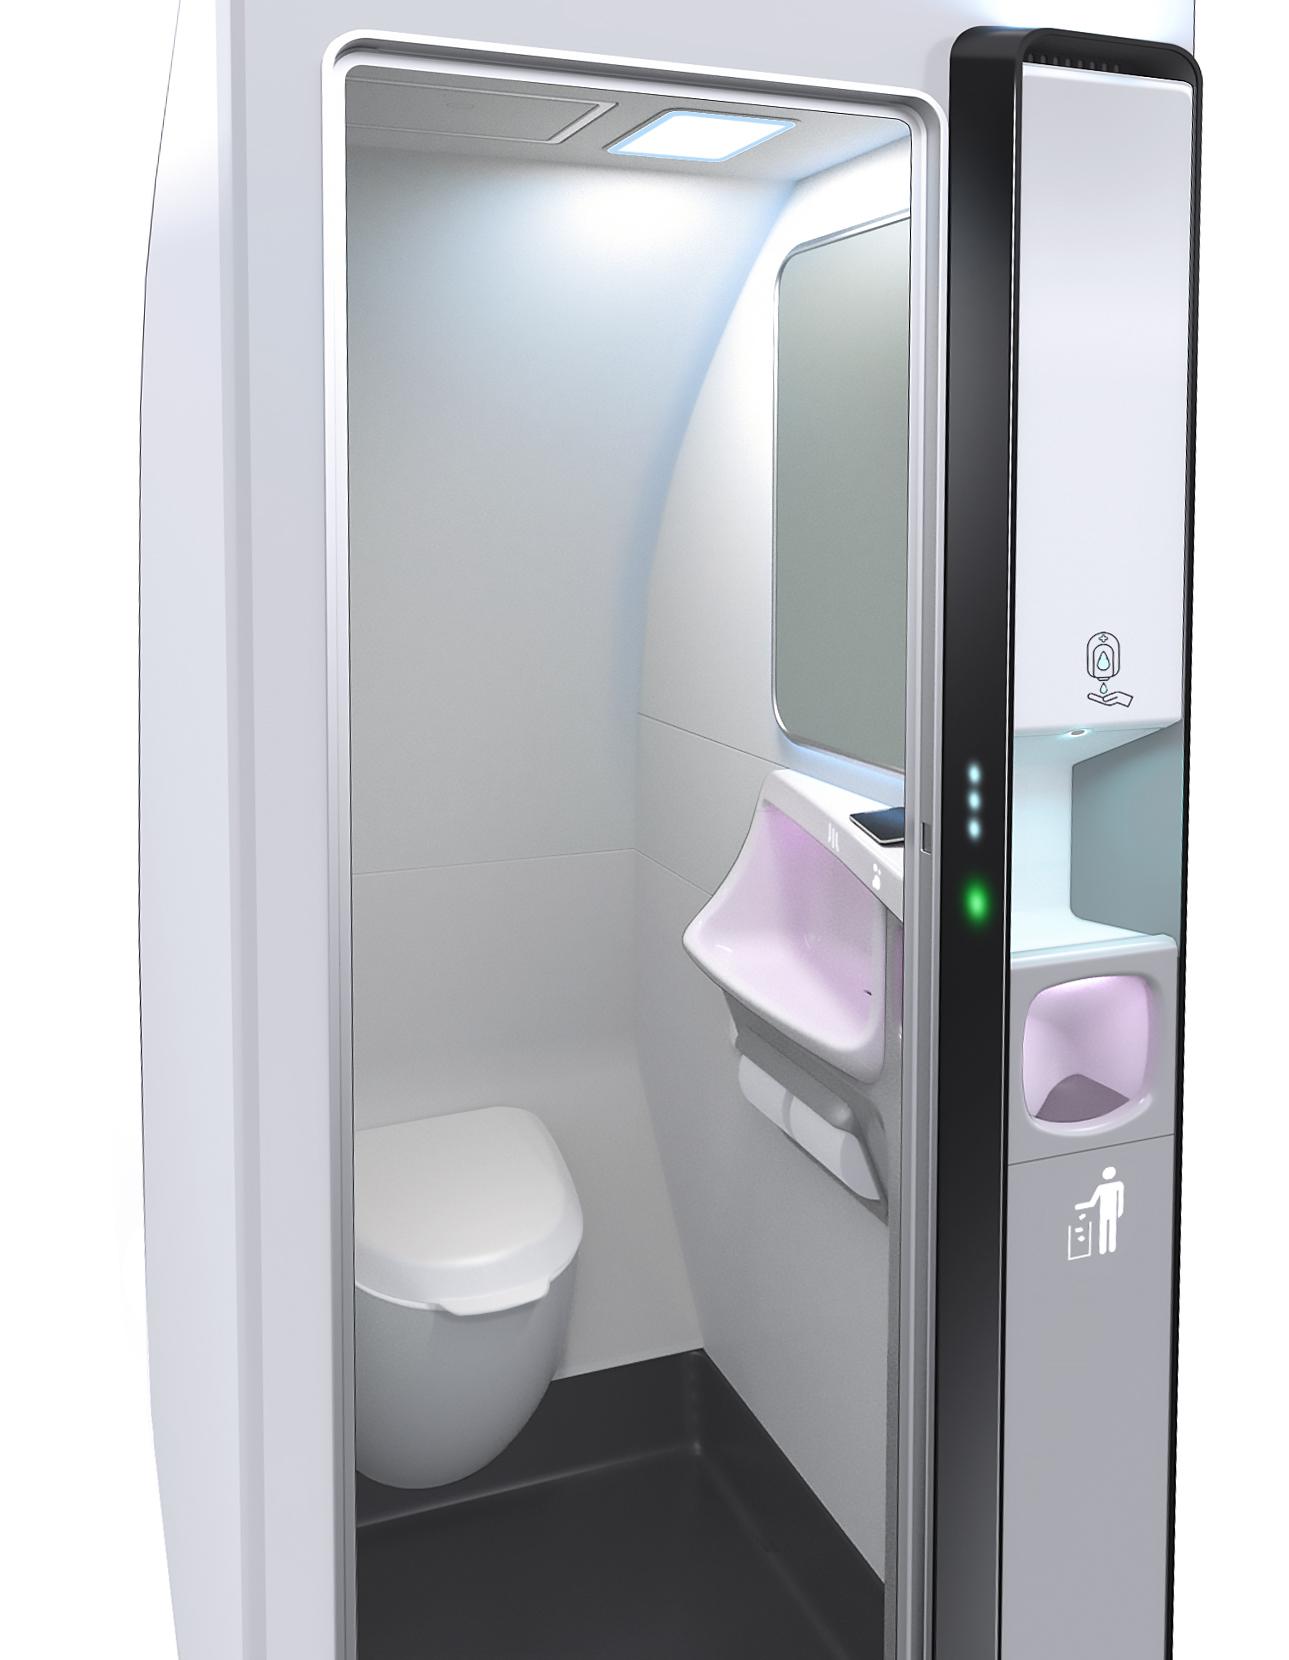 Safran Cabin's Beacon Clean Lavatory concept